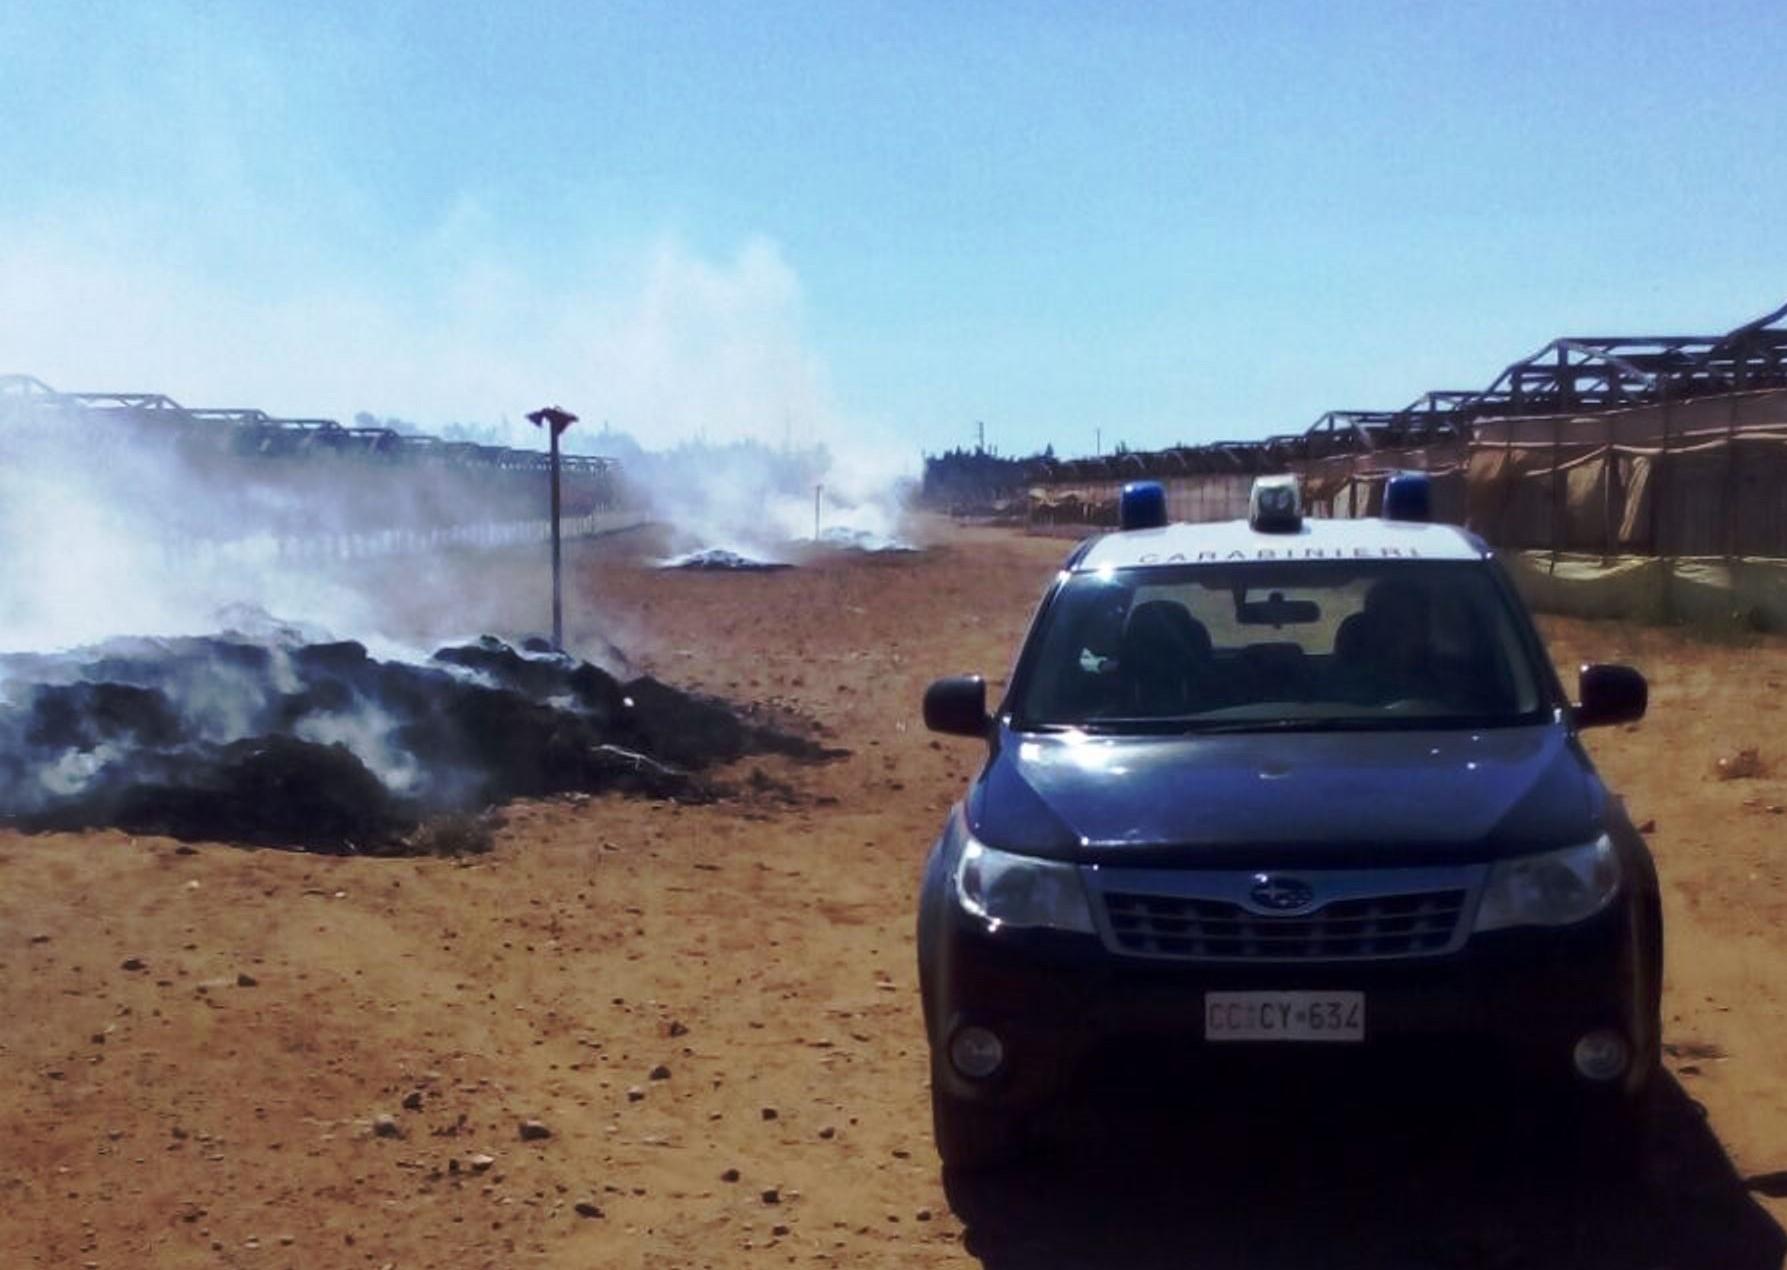 Acate, due persone denunciate per inquinamento ambientale